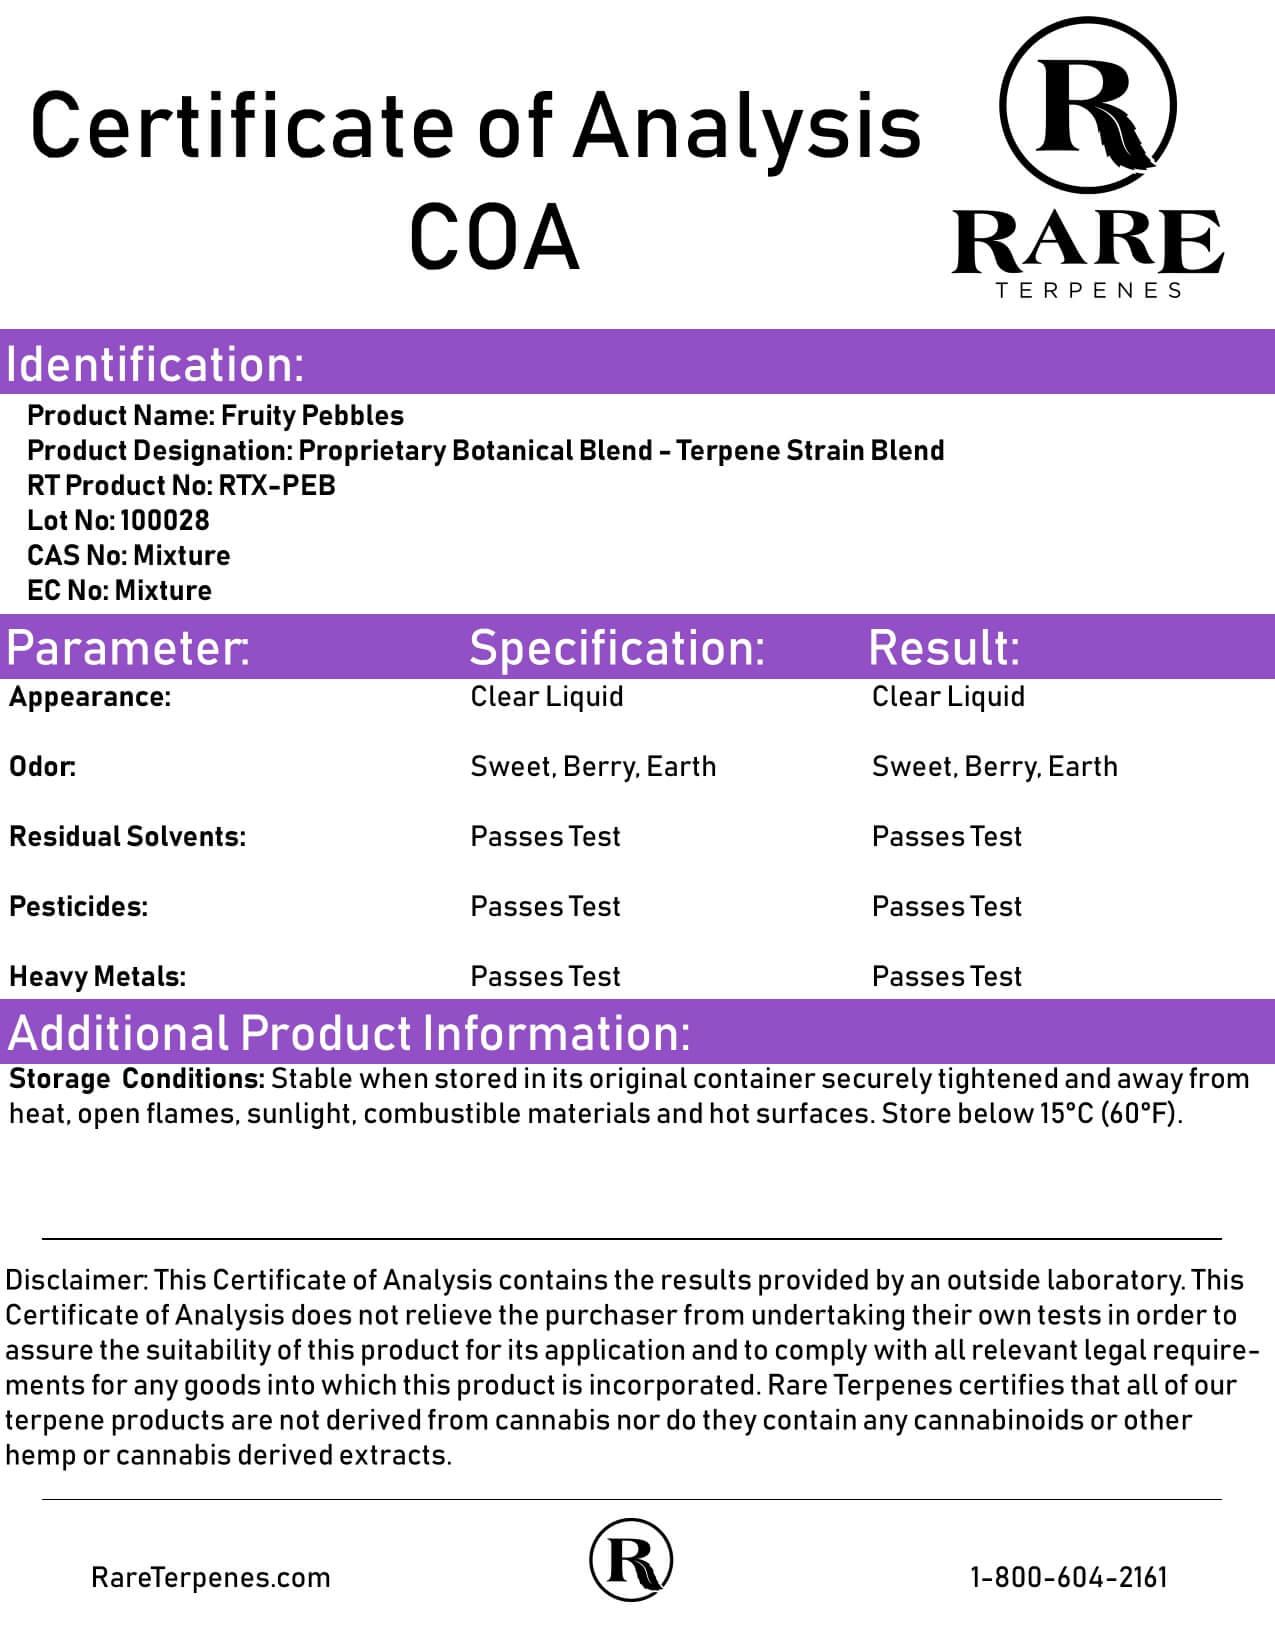 Rare Terpenes Tepene Strain Blends Fruity Pebbles Lab Report